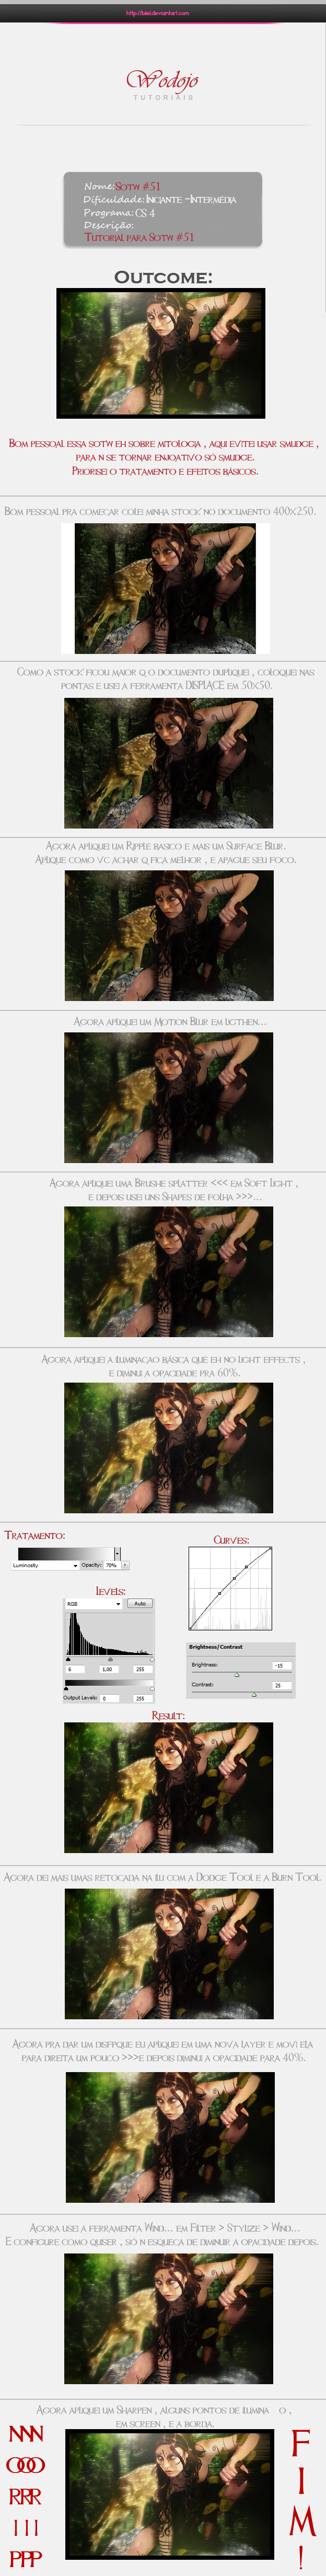 [Photoshop - Tutorial][Gfx - Mitologia by: BieeL] Tutorial_sotw_51_by_biiel-d3ago0h